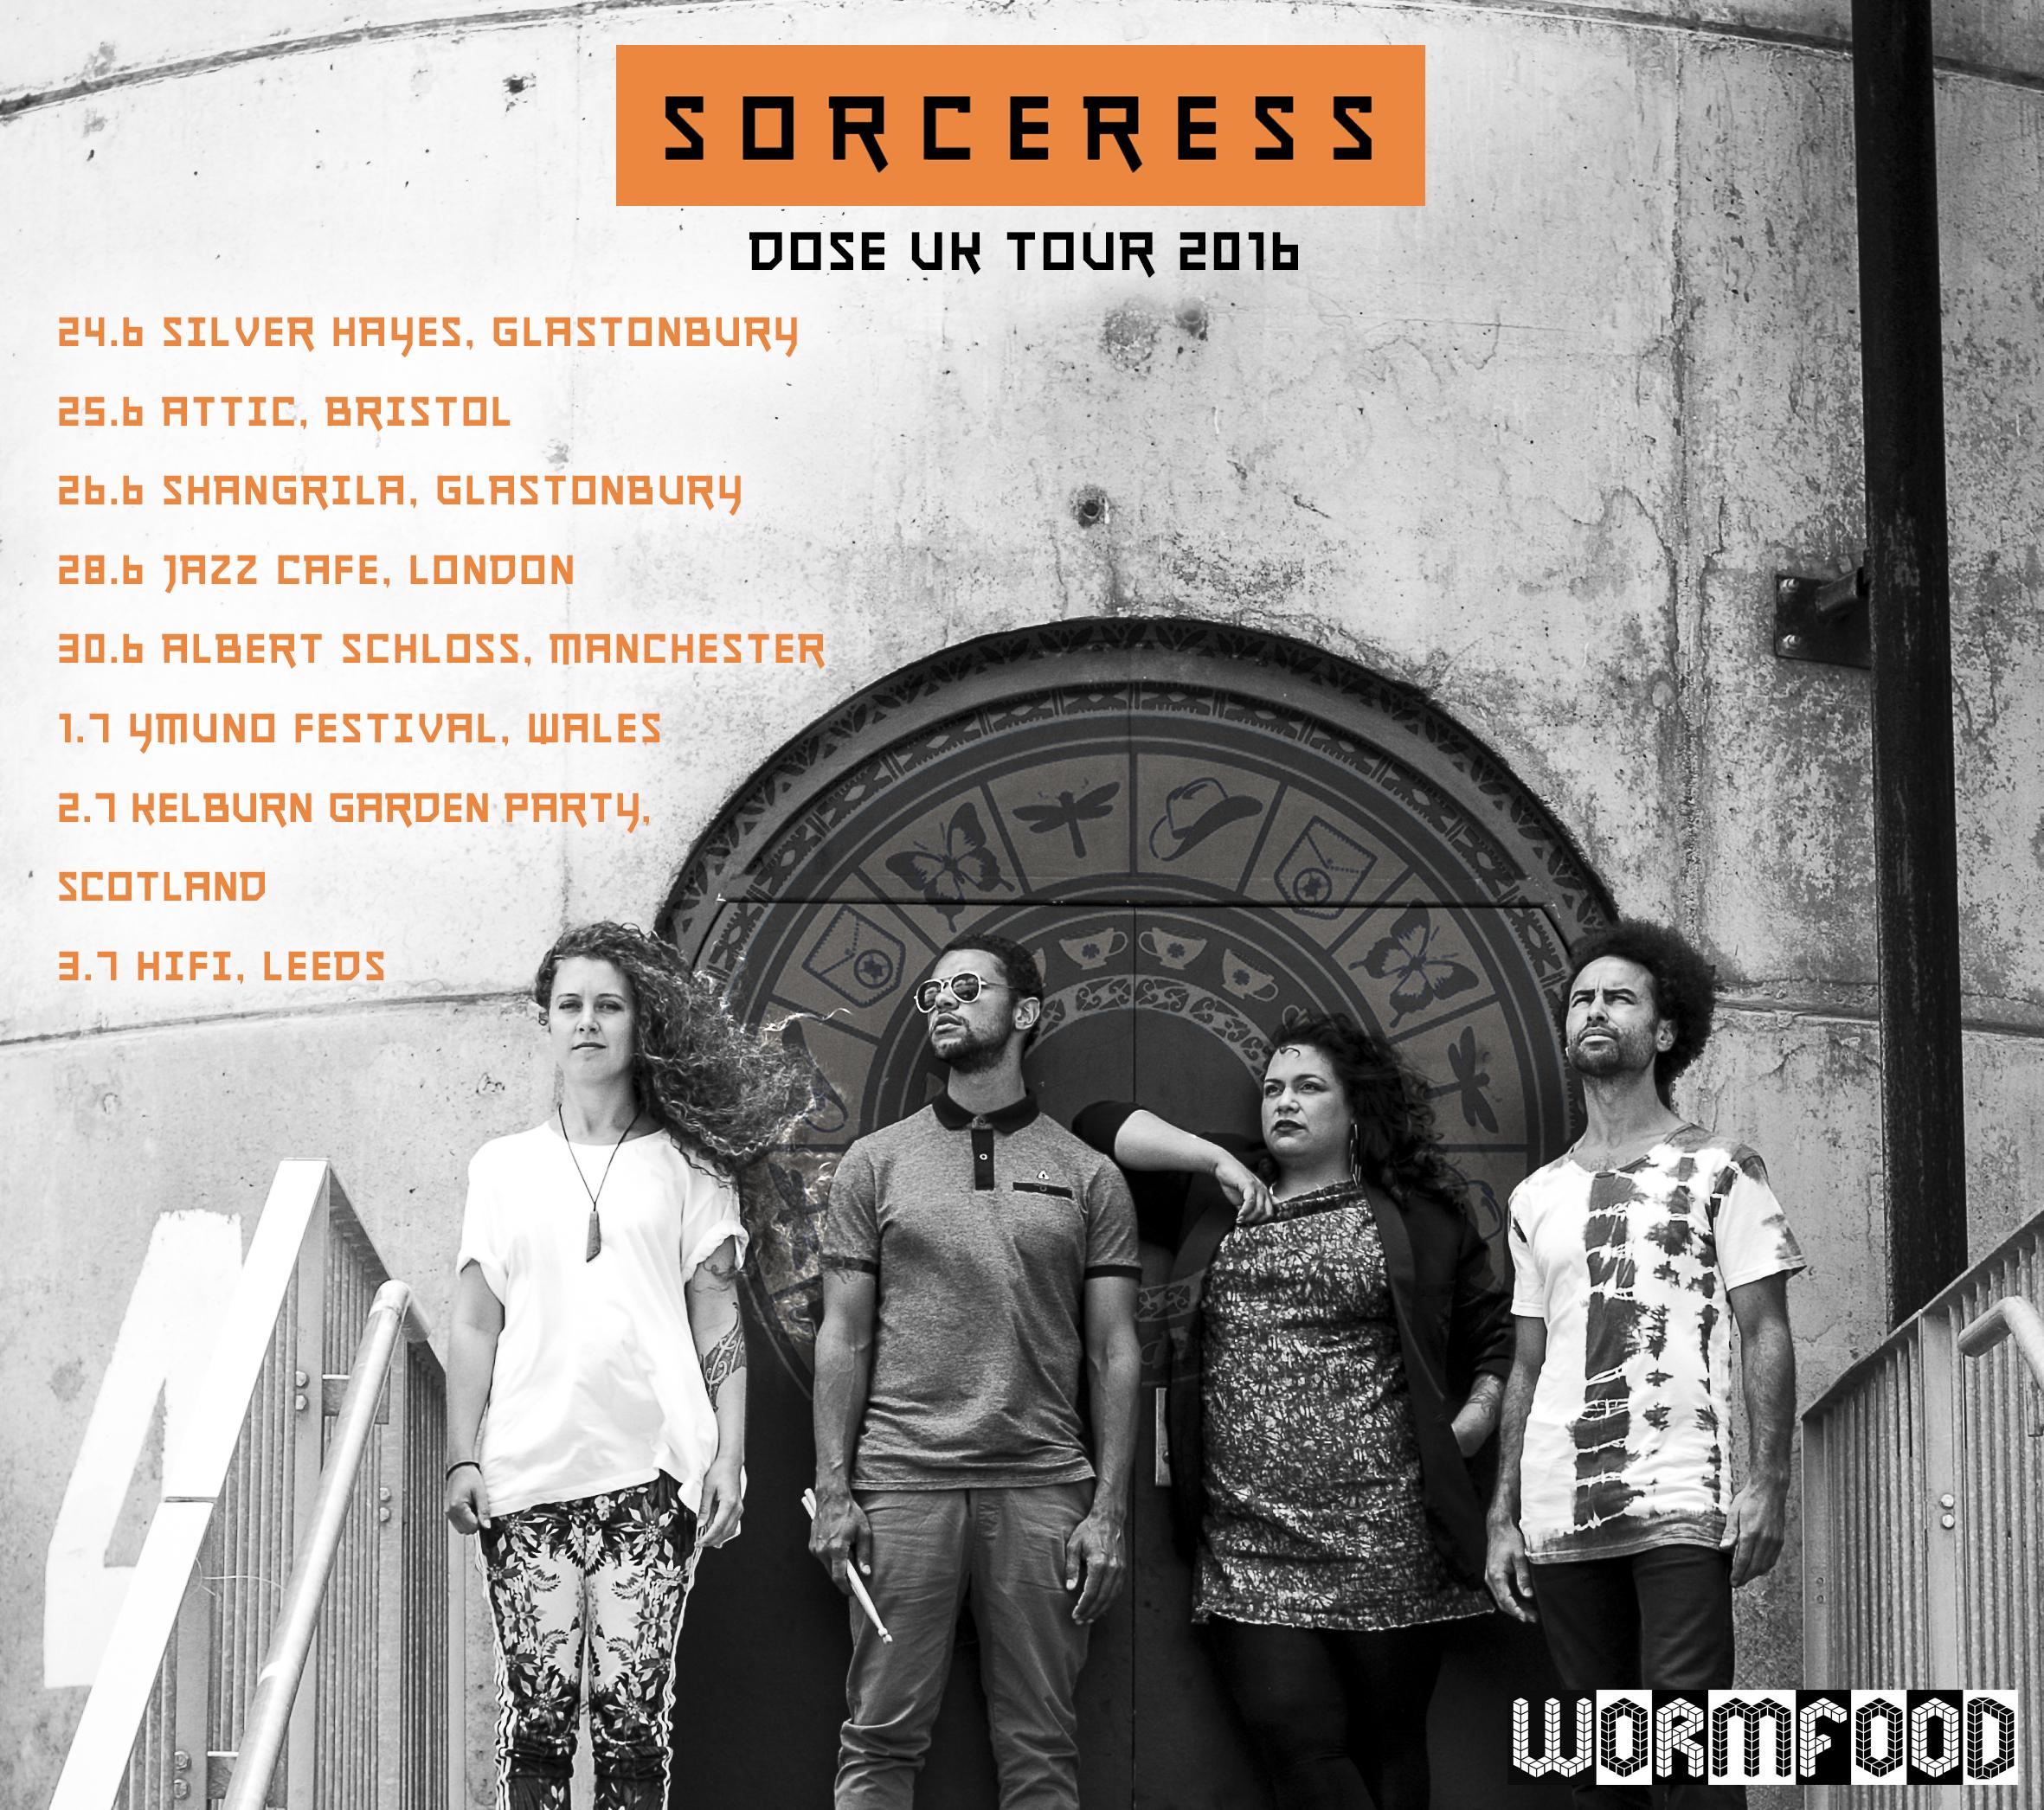 Sorceress Dose UK tour square